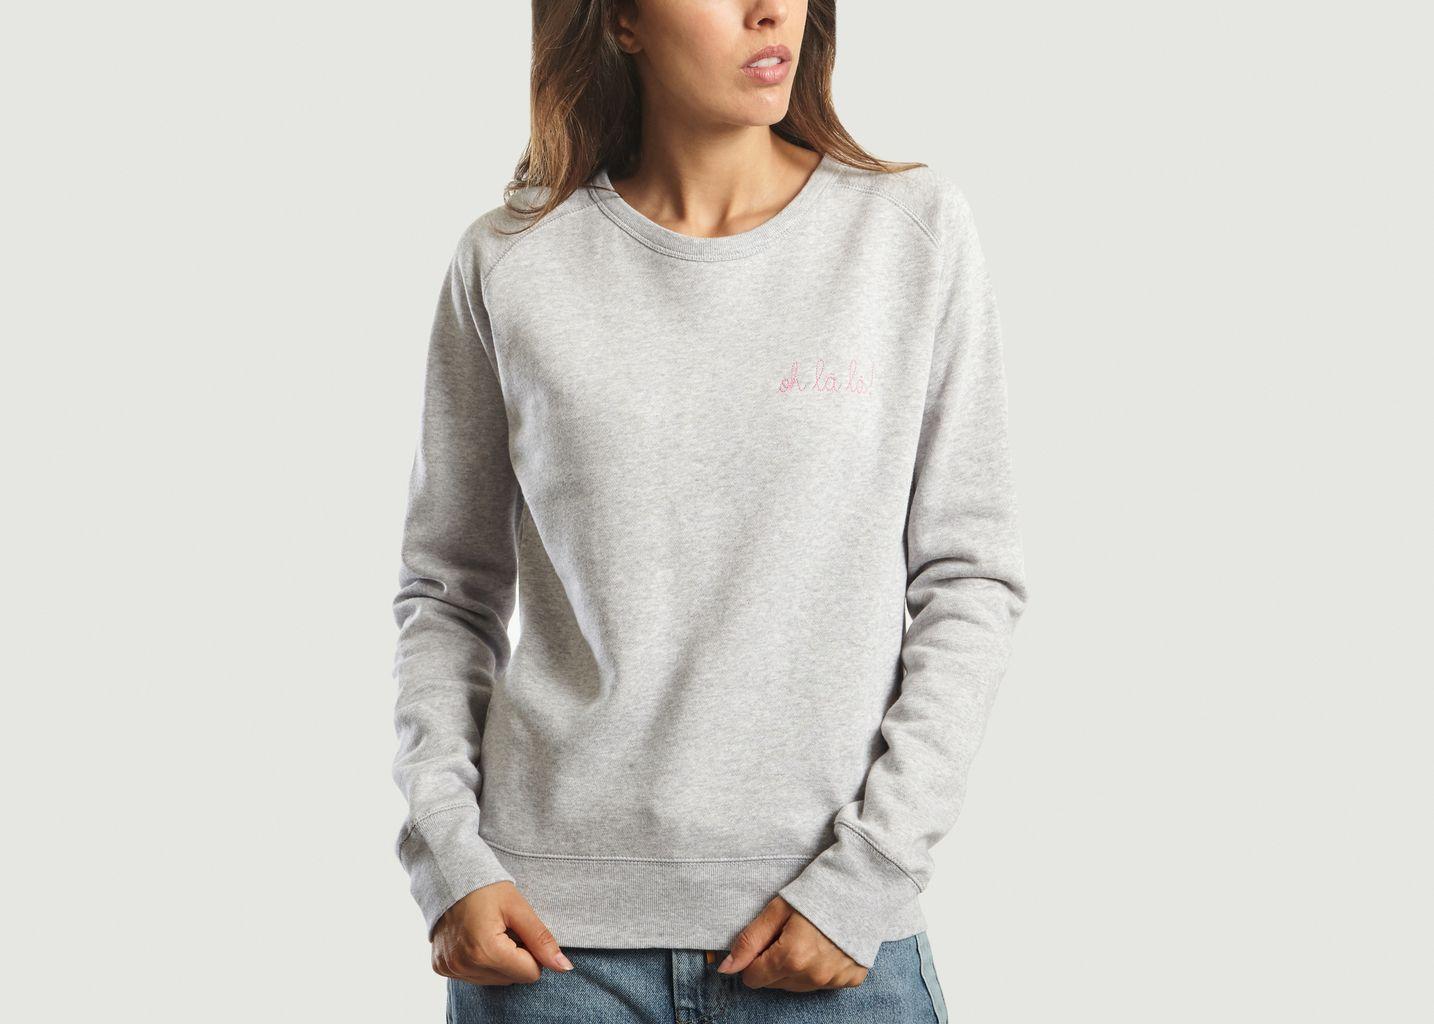 Sweatshirt Oh Là Là ! - Maison Labiche